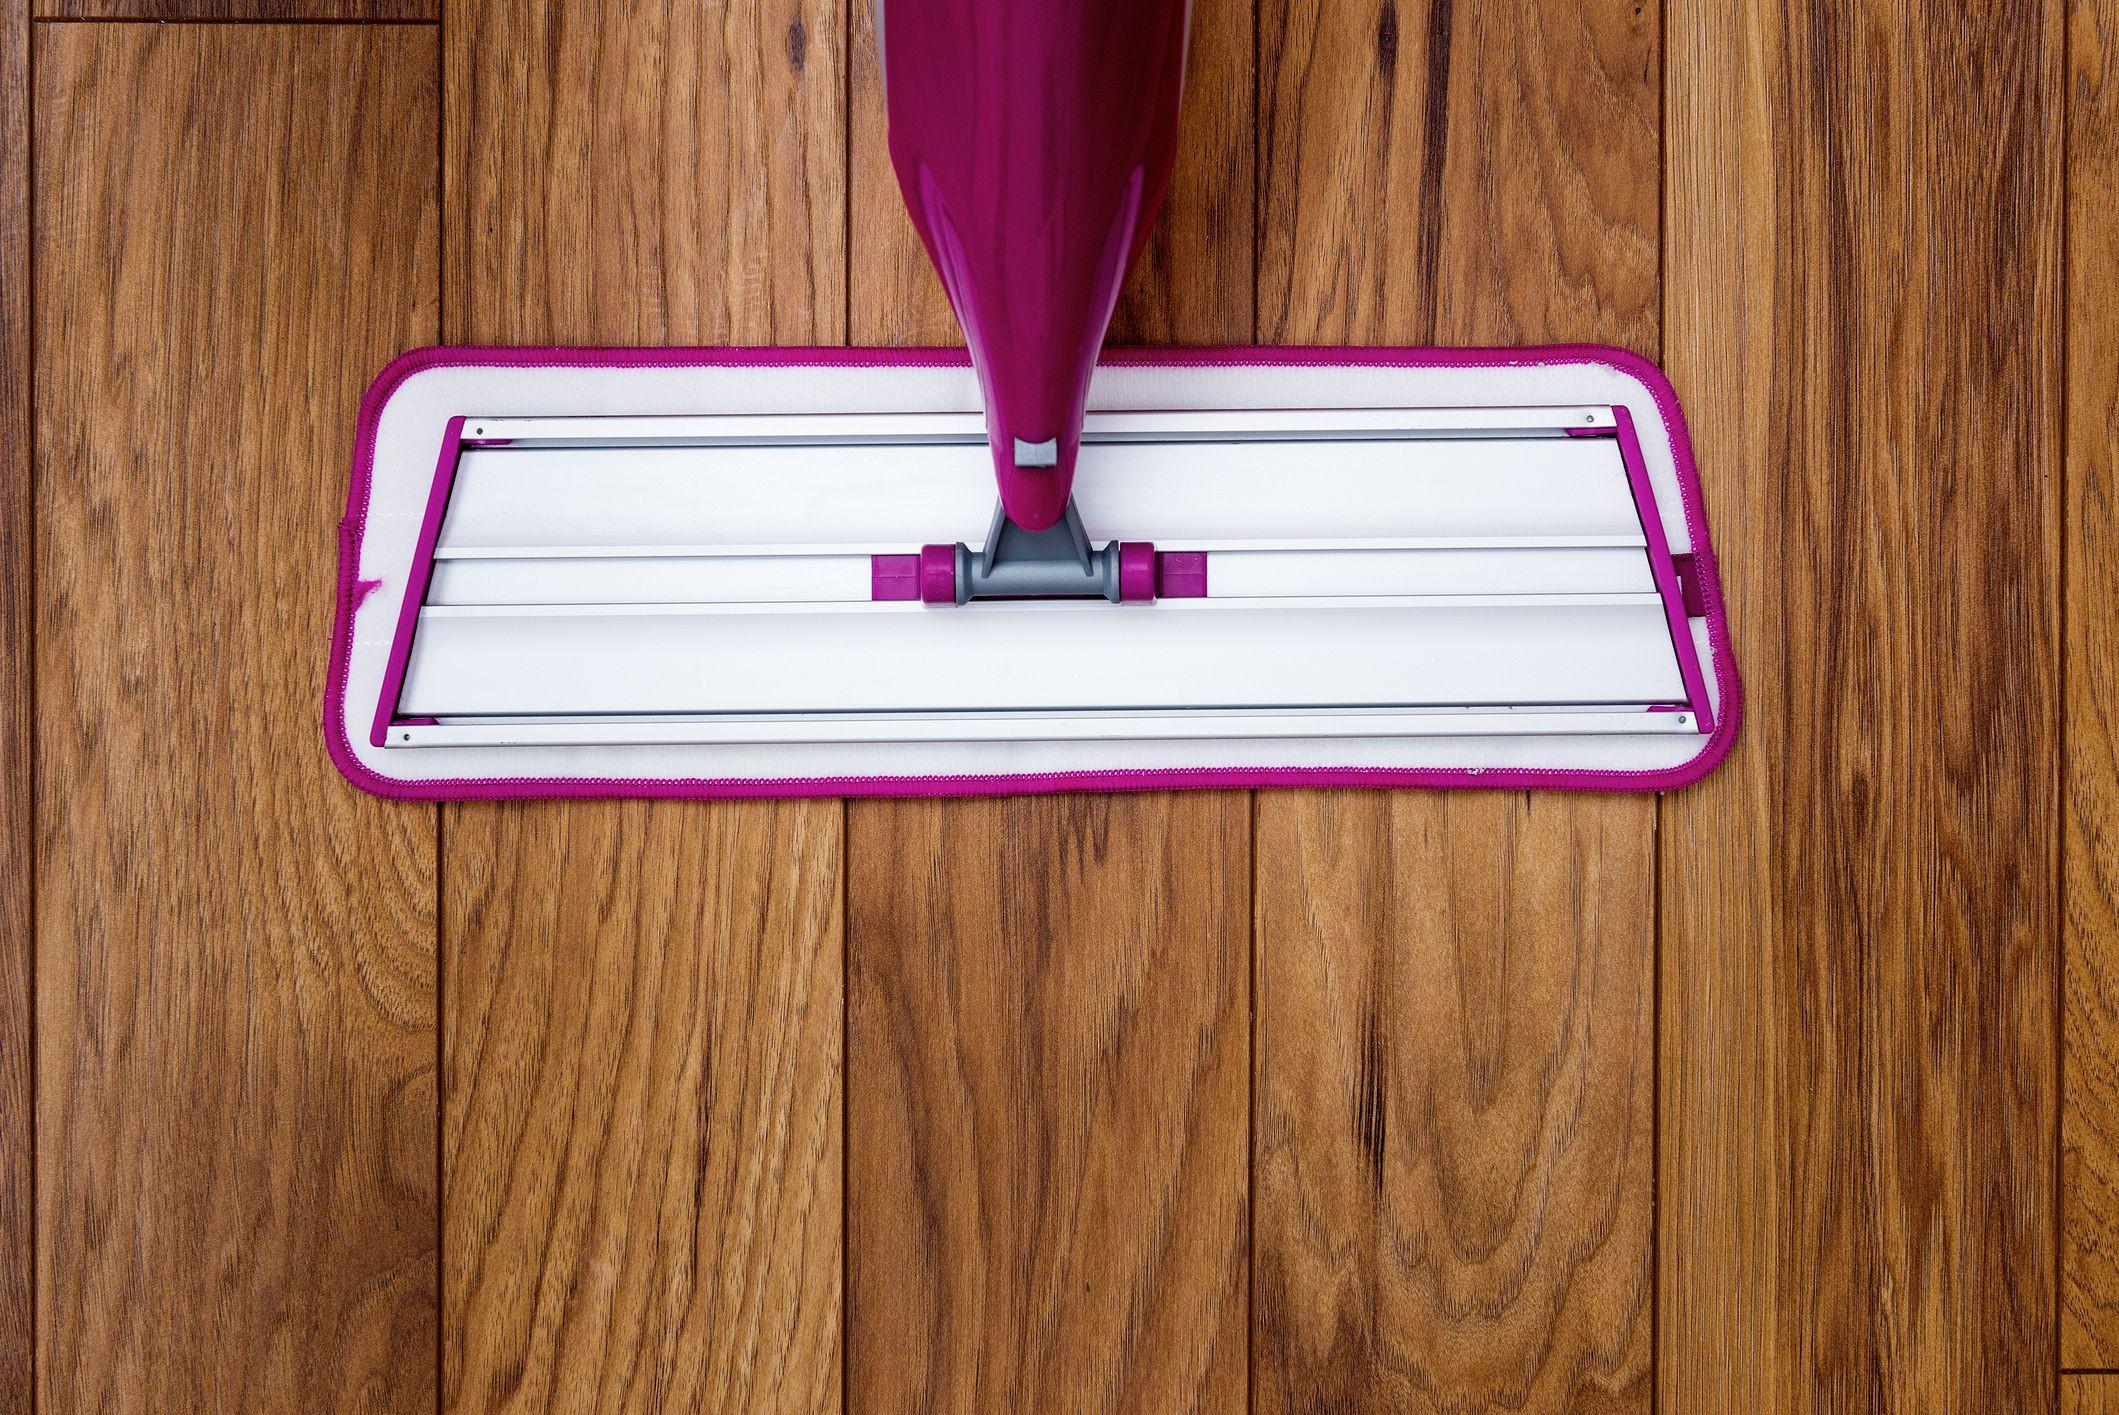 orange glo hardwood floor care kit of the best way to clean laminate floors in mop gettyimages 510300933 586f0aa15f9b584db33595ee